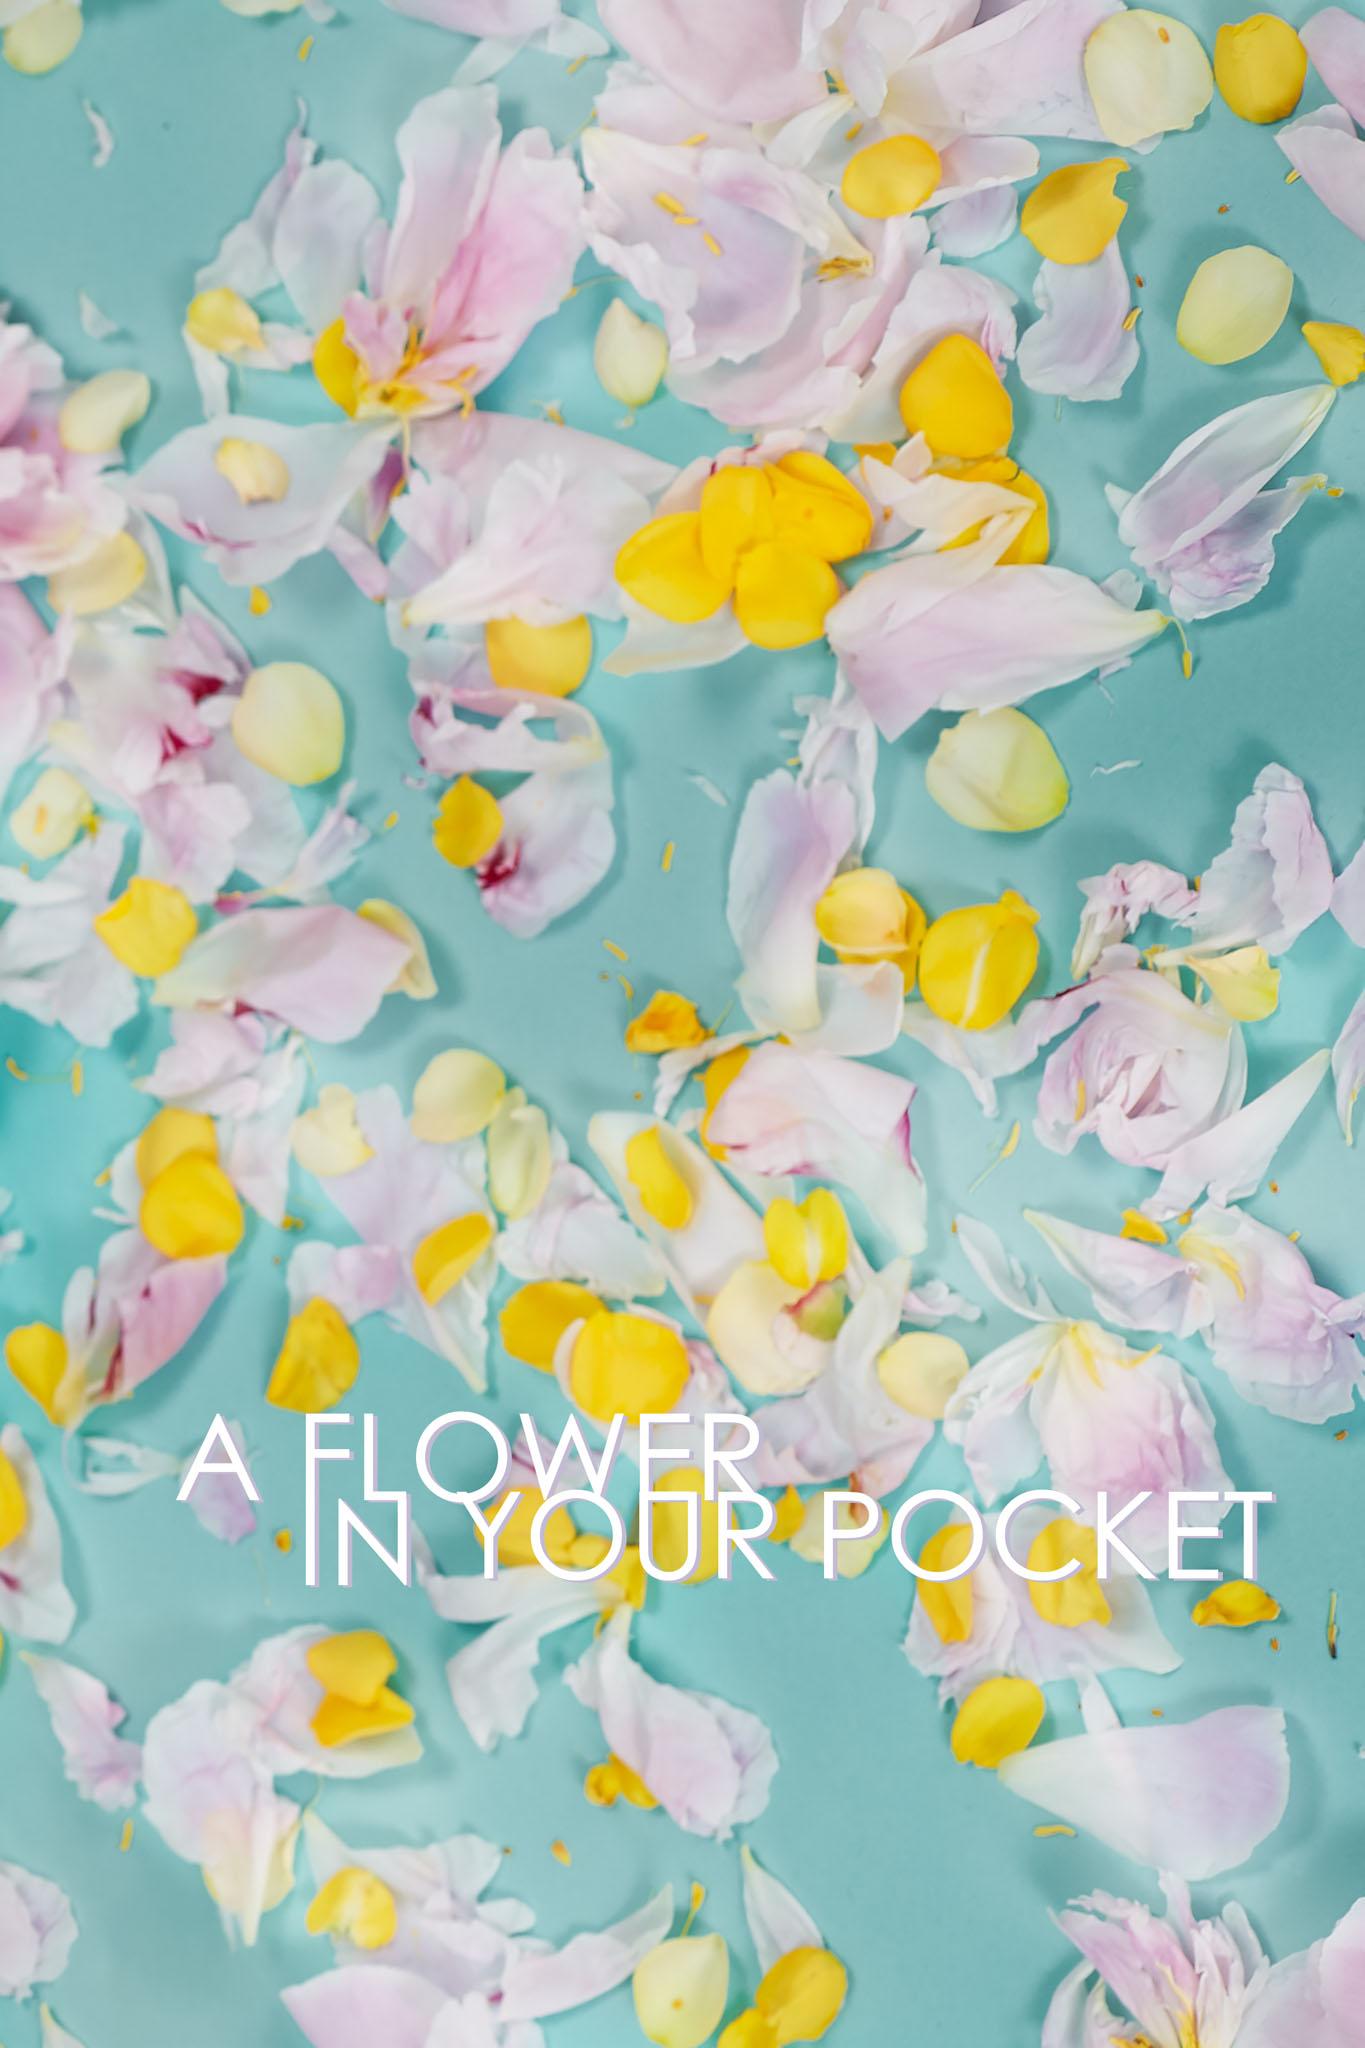 001_a_flower_in_your_pocket_evgeniy_sorbo.jpg